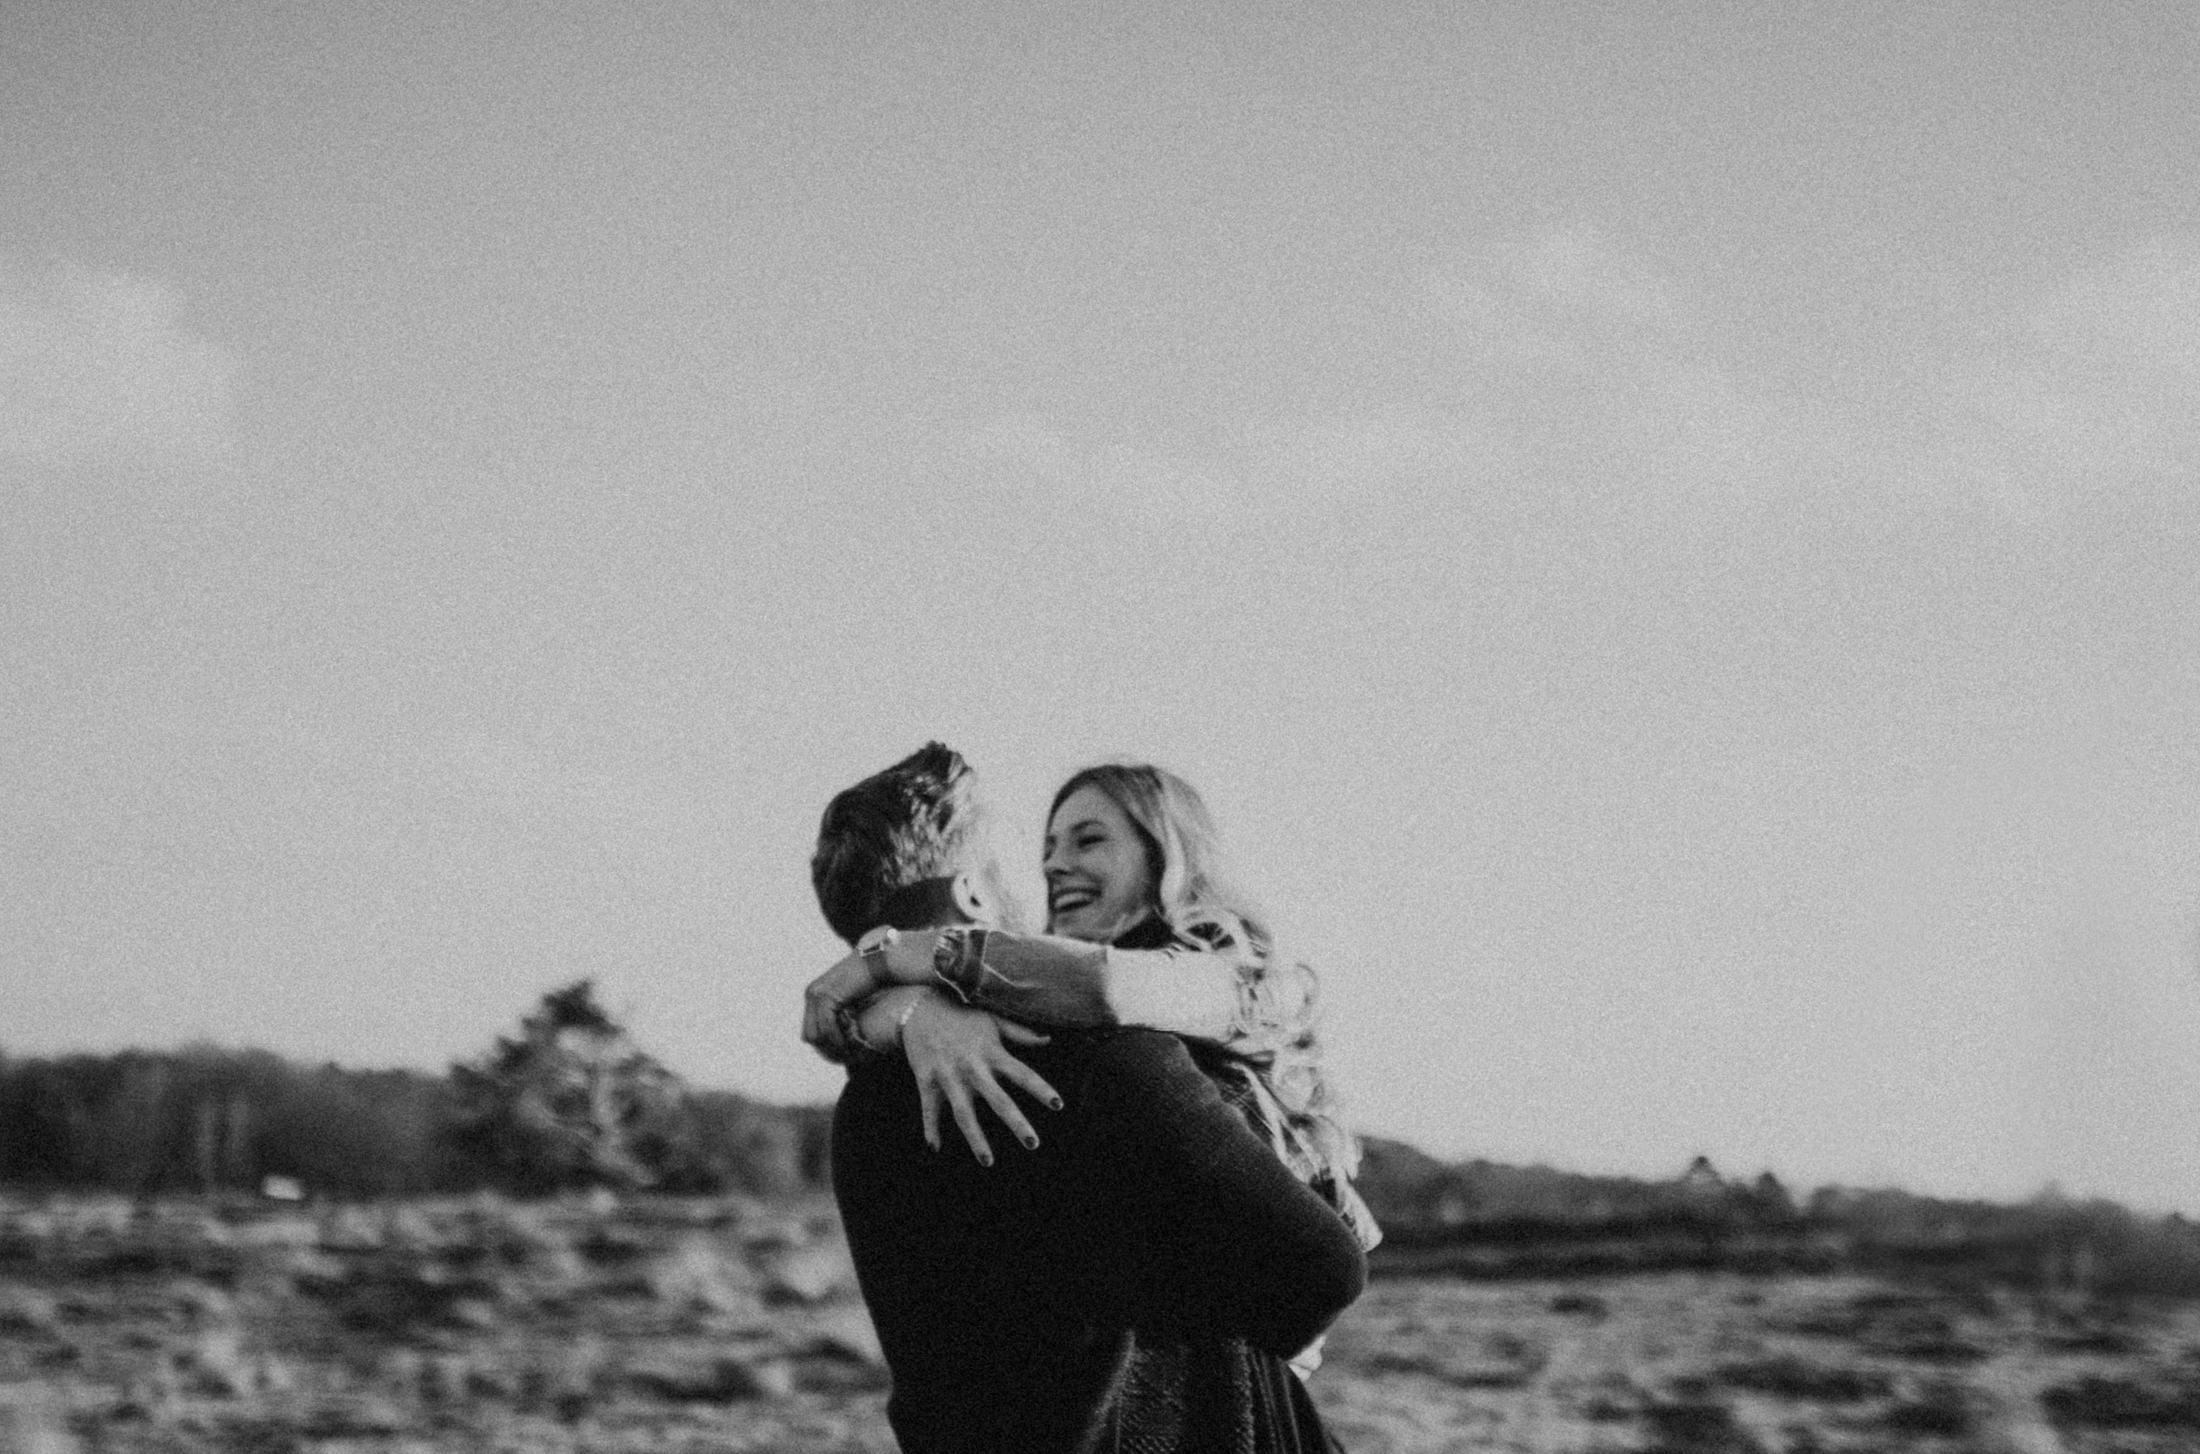 Wedding_Photographer_Mallorca_Daniela-Marquardt_Photography_CanaryIslands_Lanzarote_Iceland_Tuskany_Santorini_Portugal__Austria_Elopement_Hochzeitsfotograf_Milena_Marvin_18